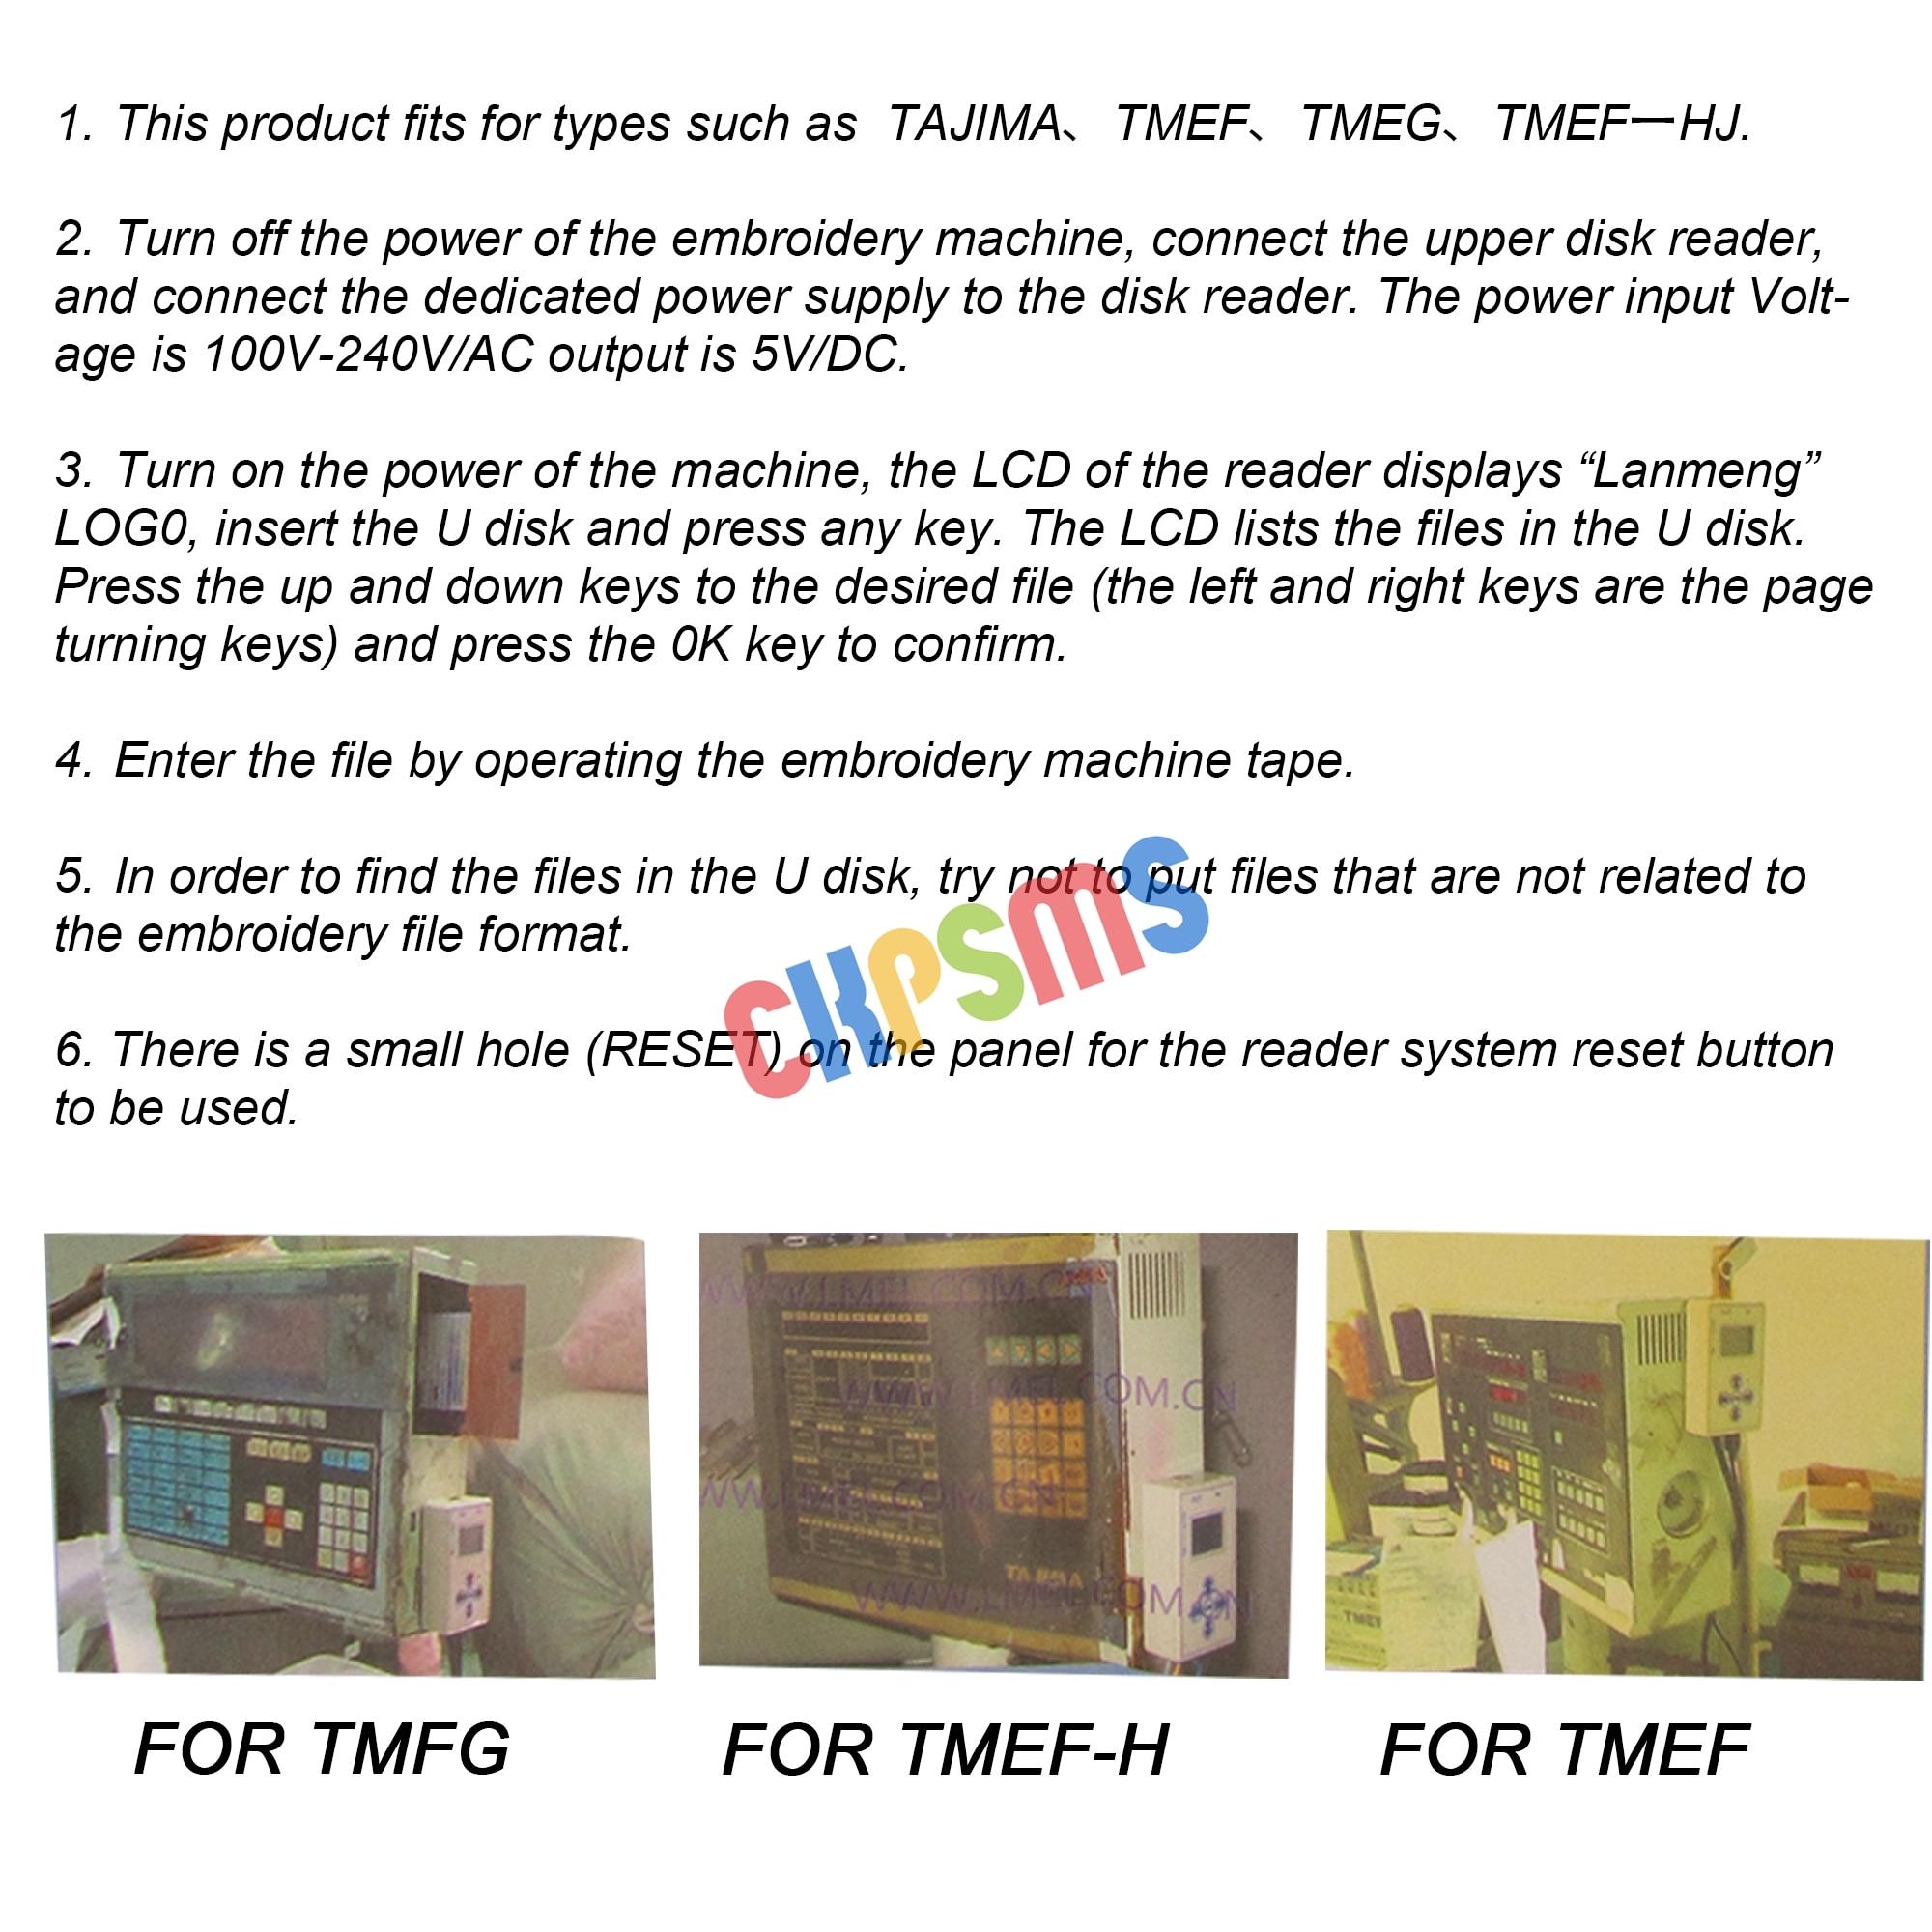 USB READER for Tajima embroidery machine TMFX TMEF TME-DC TMEX TMEF-H TMEG